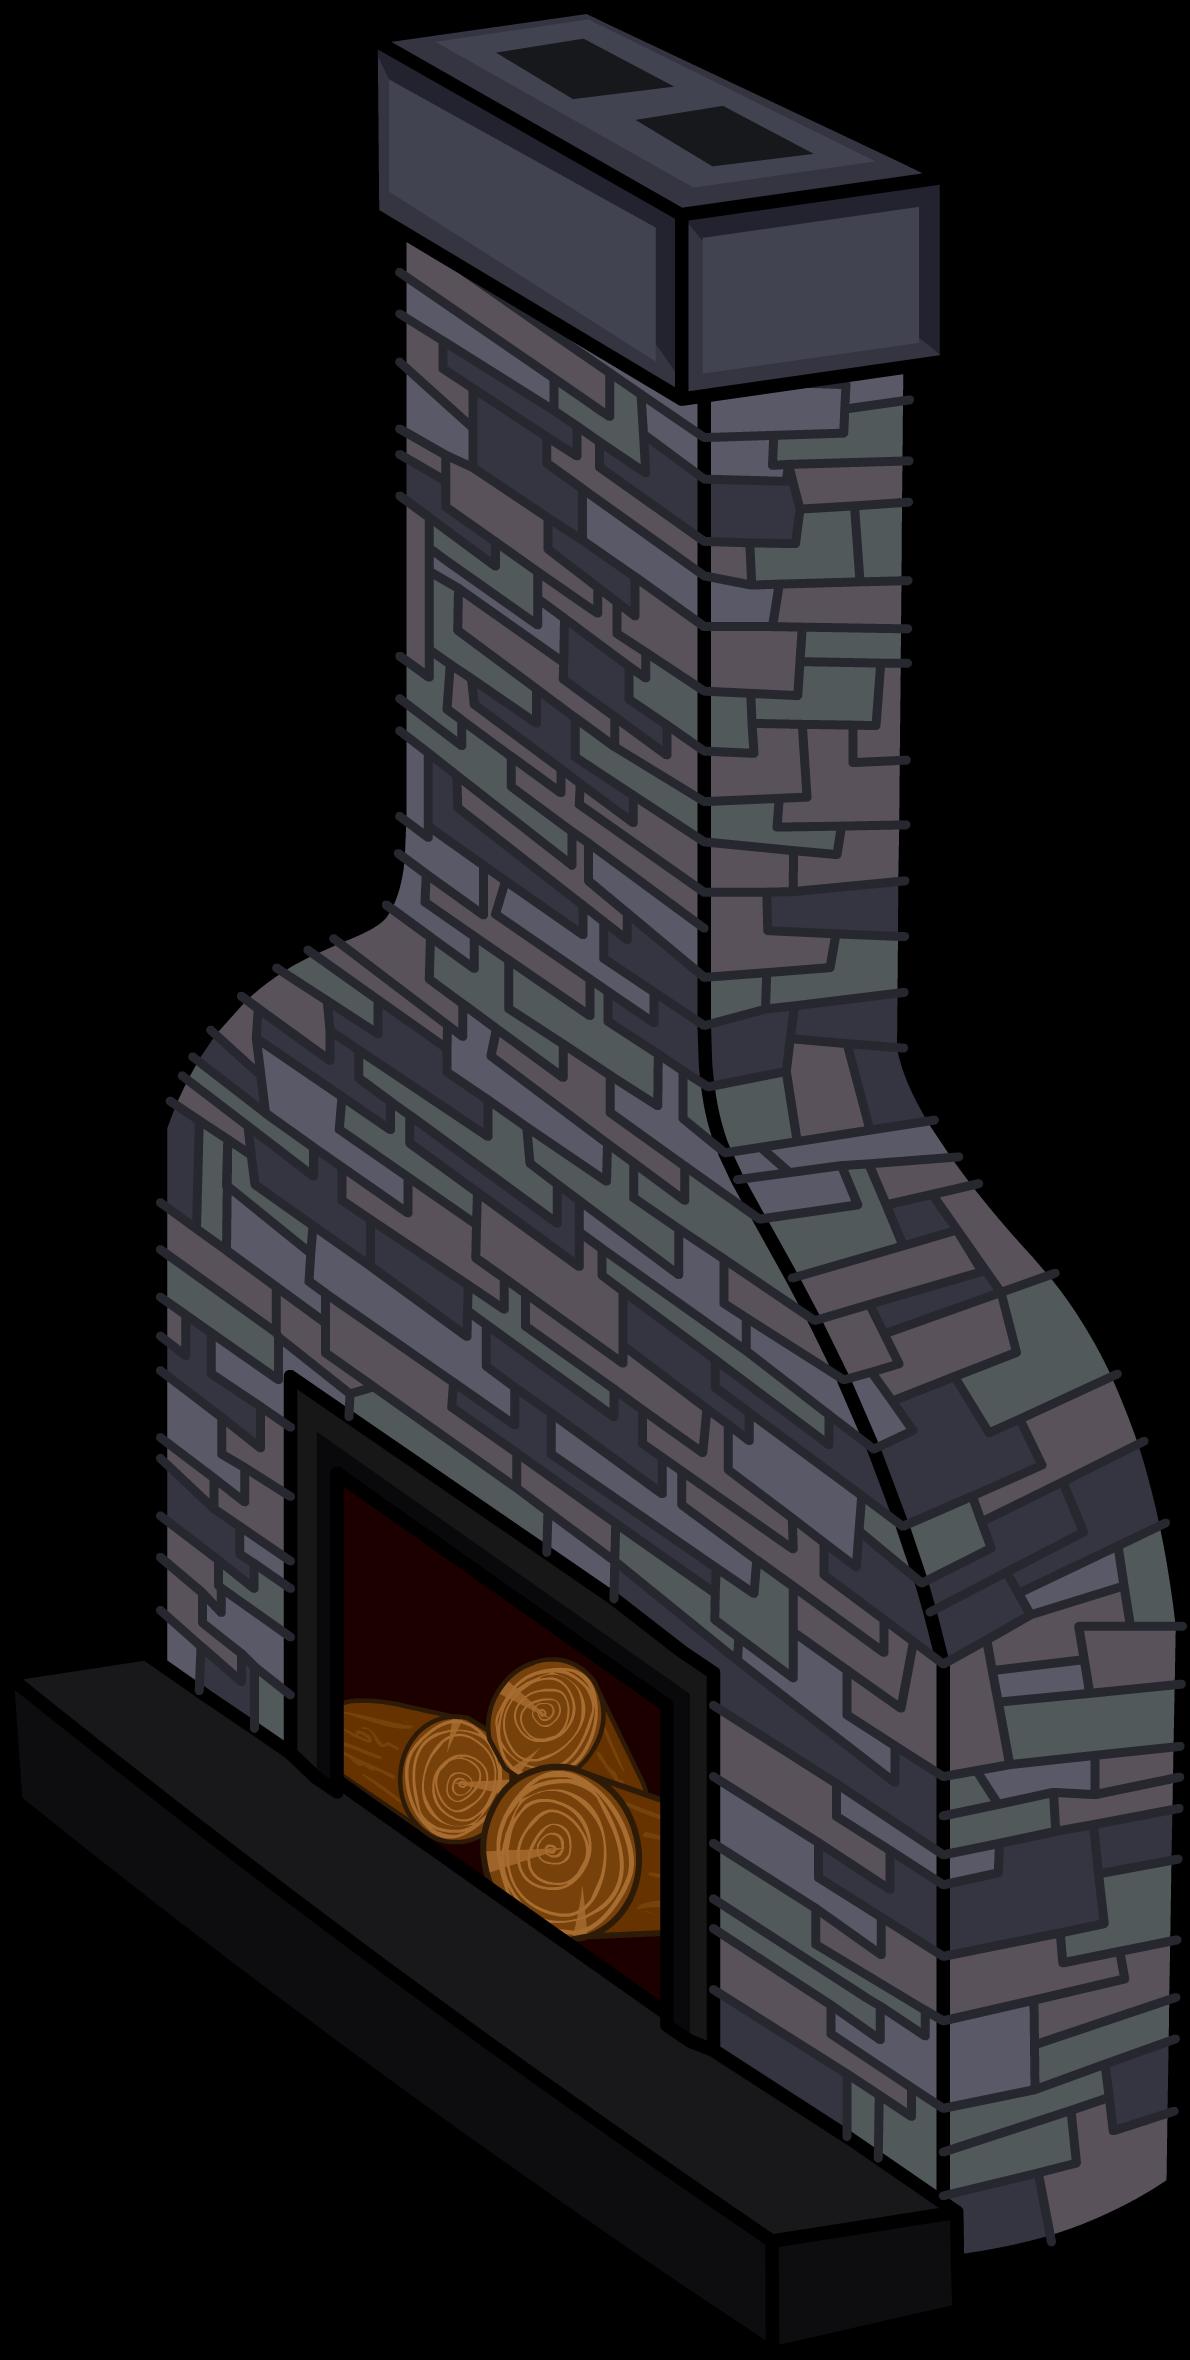 image cozy fireplace sprite 009 png club penguin wiki fandom